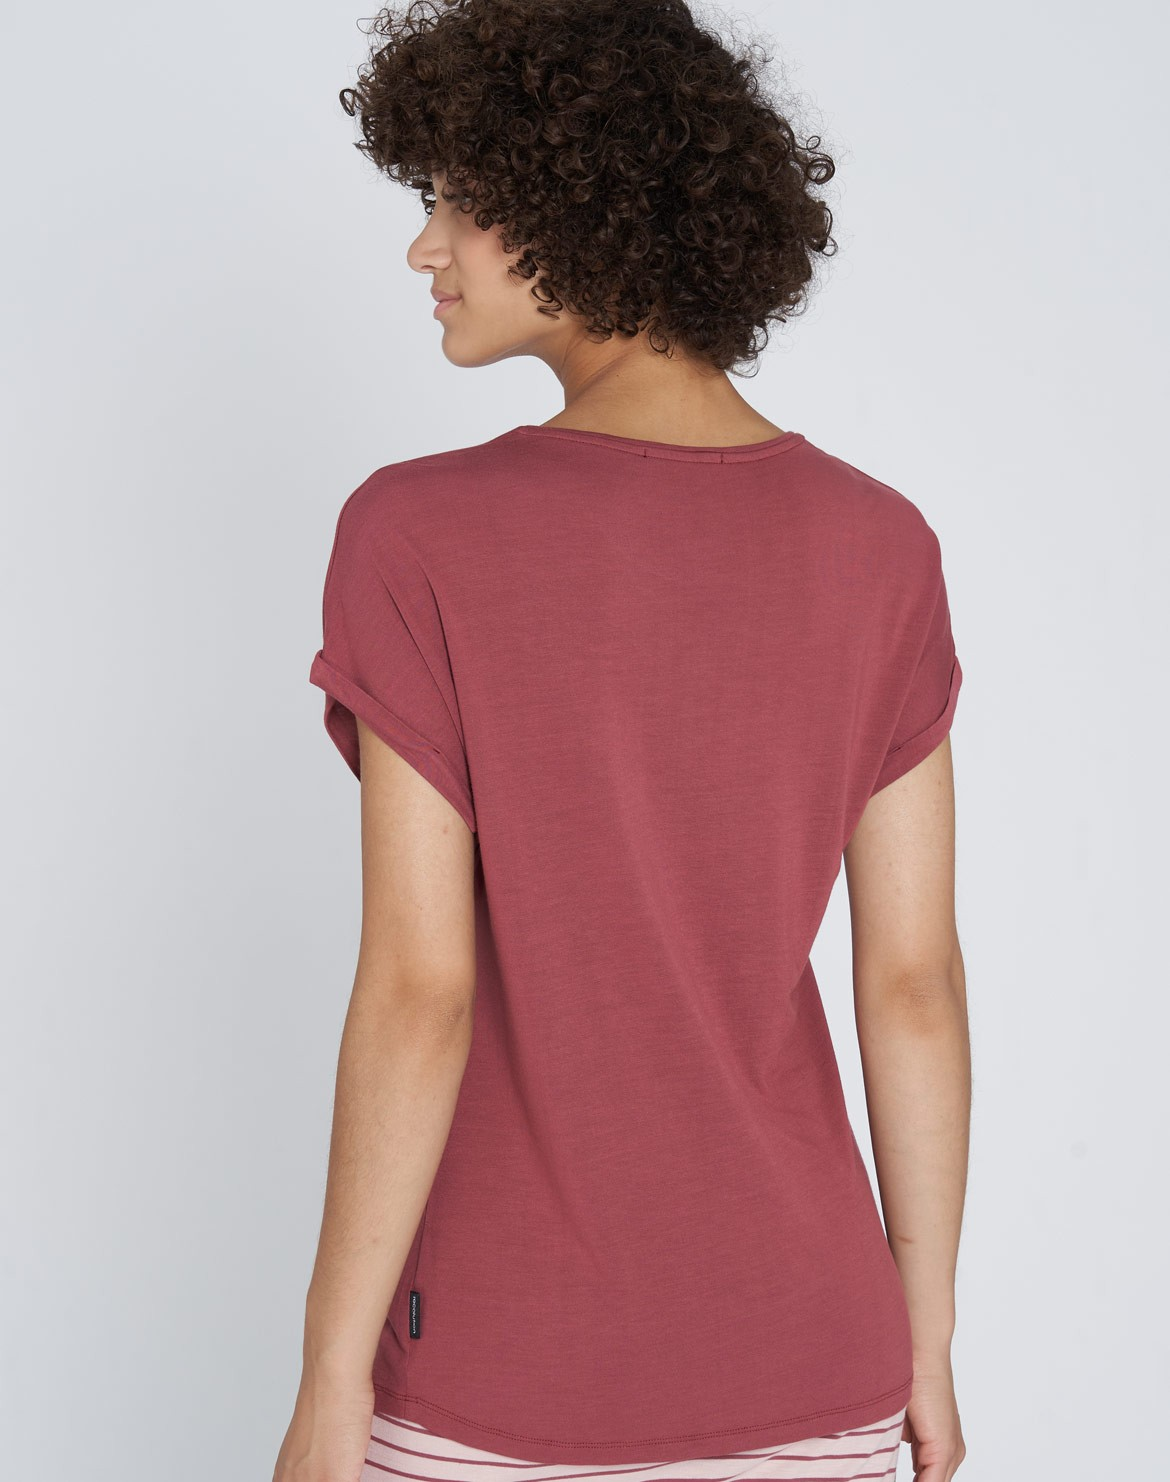 Turn-Up EcoVero T-Shirt